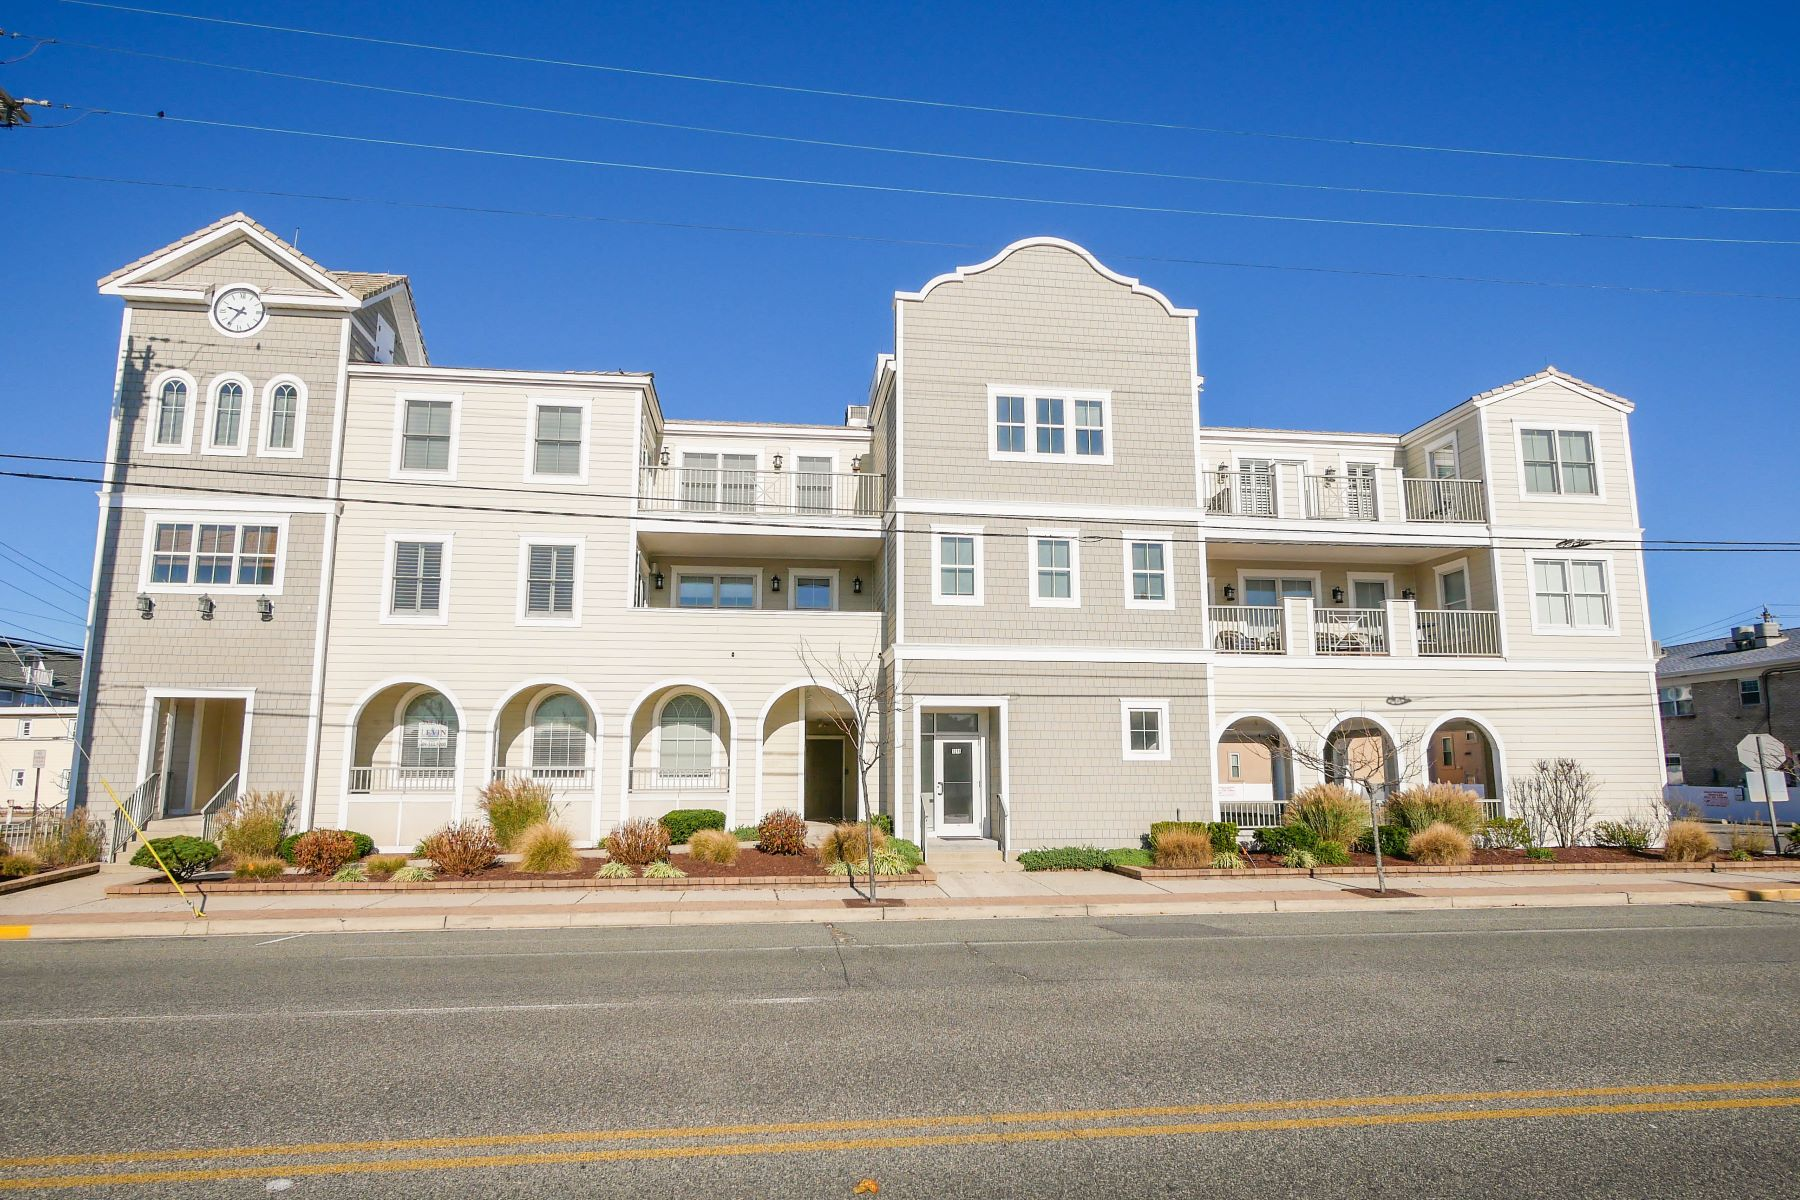 Condominiums for Rent at 9219 Atlantic Ave Unit #1, SPLIT SEASON SECOND HALF, Margate, New Jersey 08402 United States